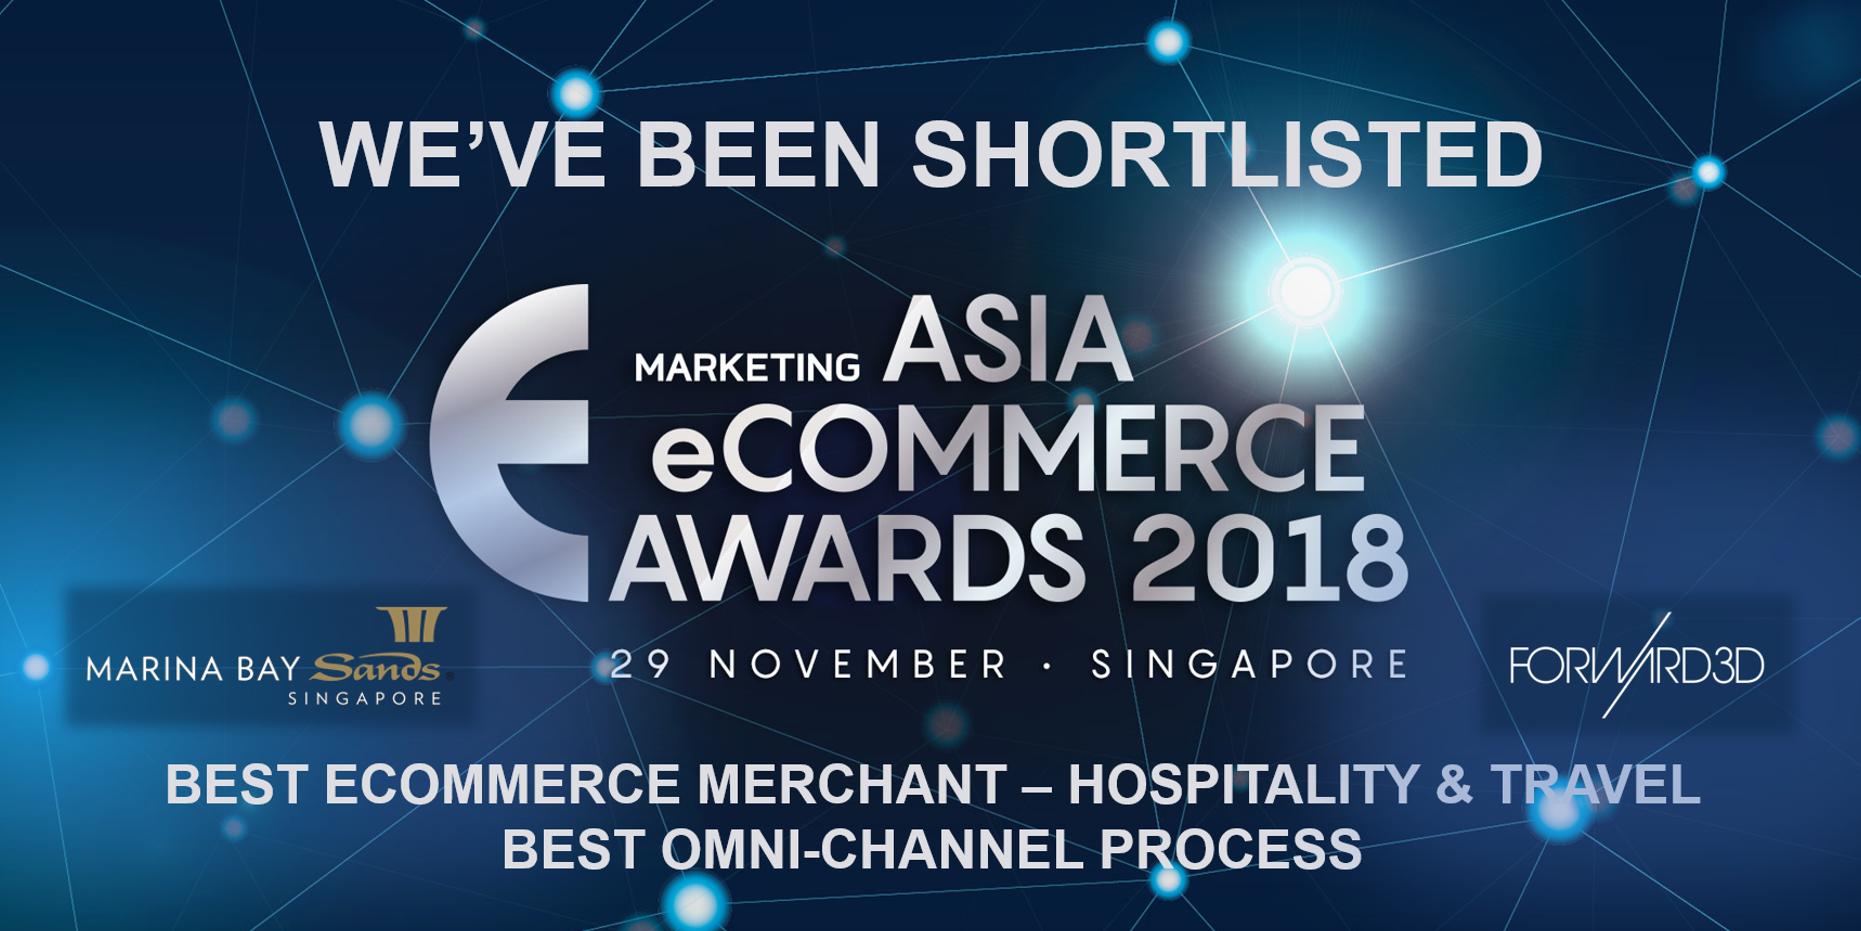 ecommerce awards shoutout.png